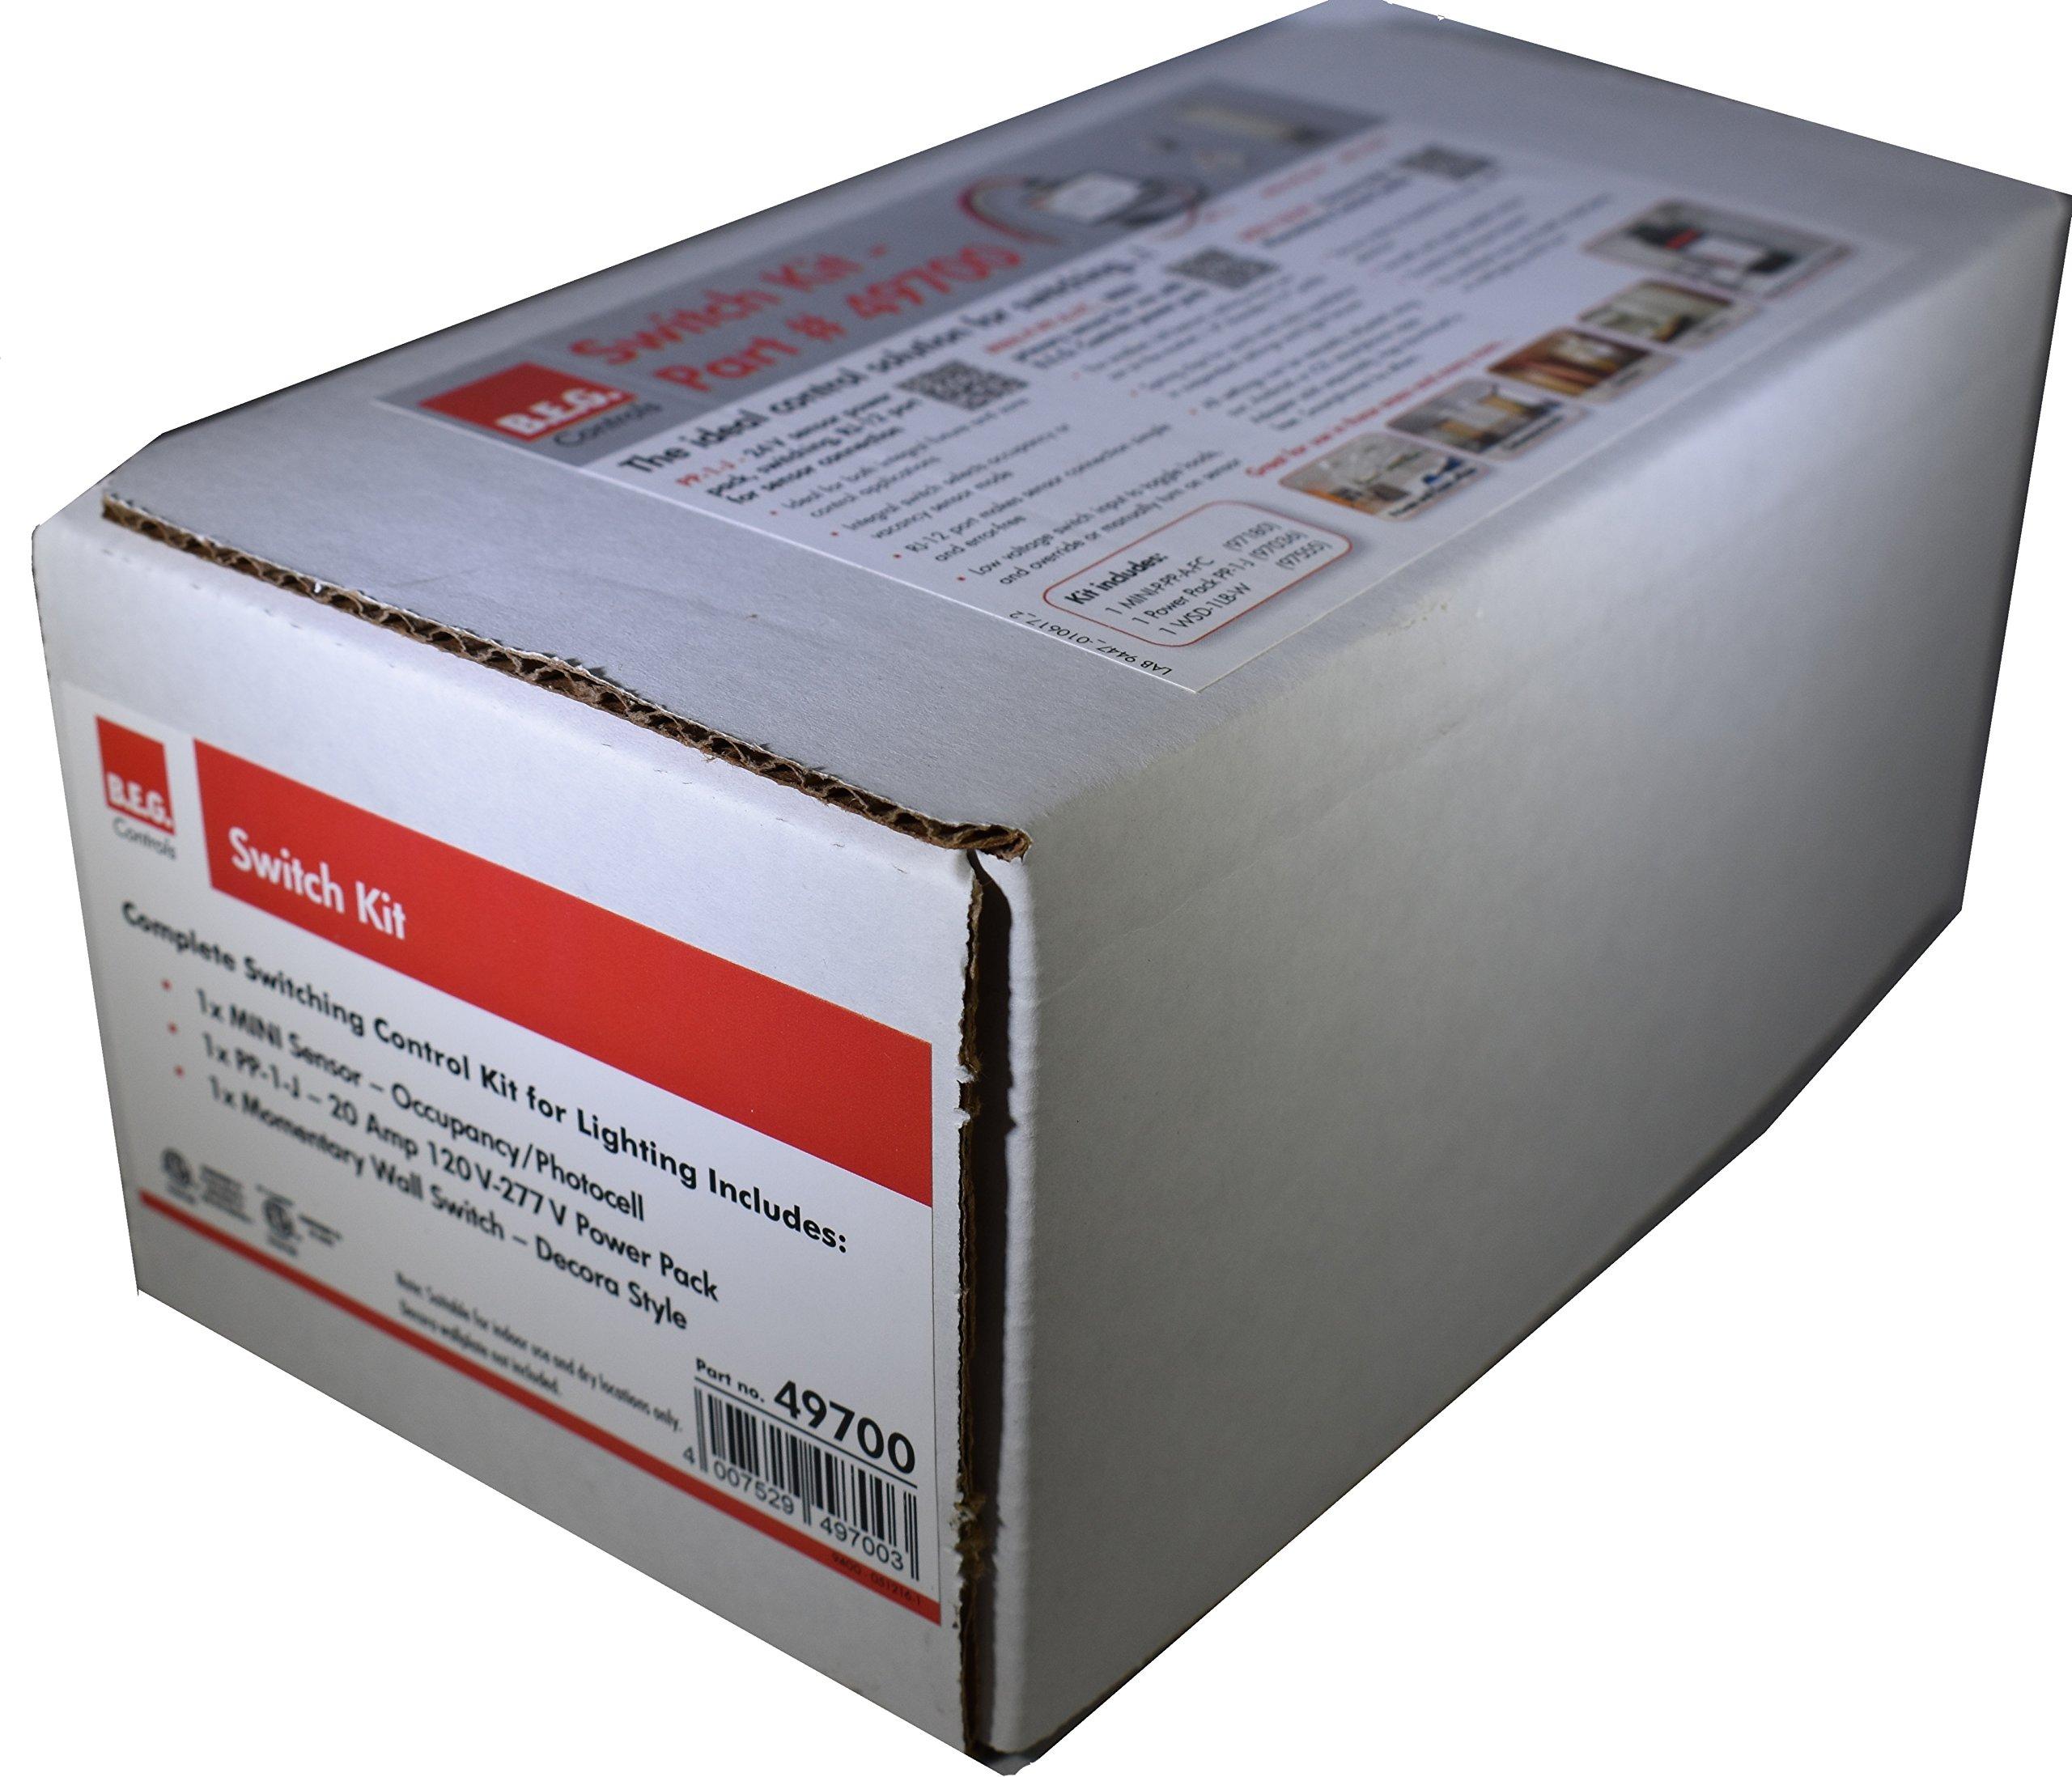 Mini Motion/Daylight Ceiling Sensor-Switch Kit